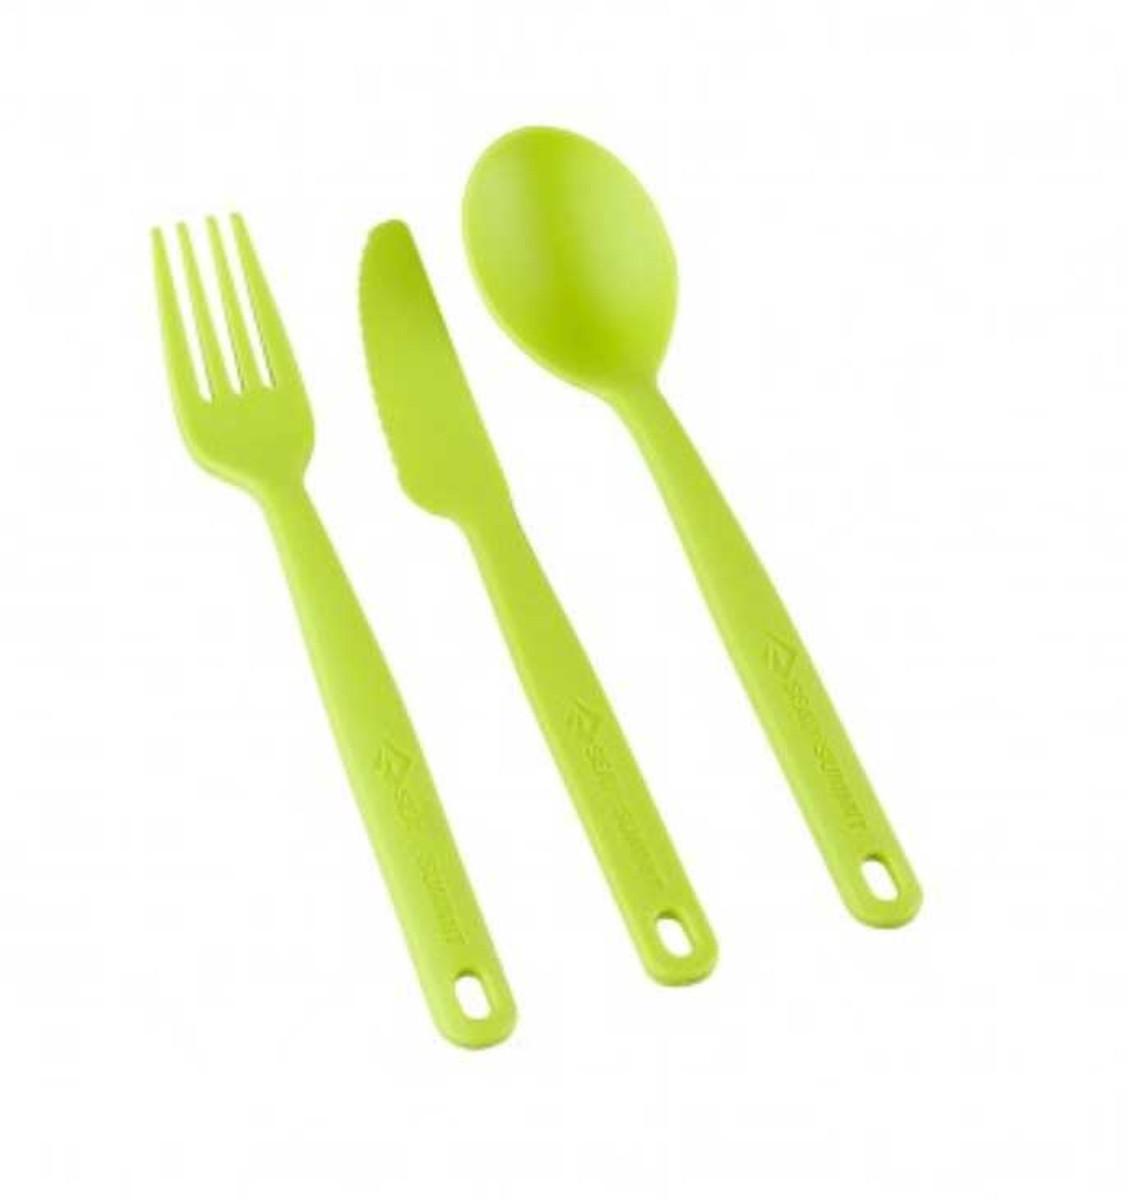 Sea to Summit camp cutlery set